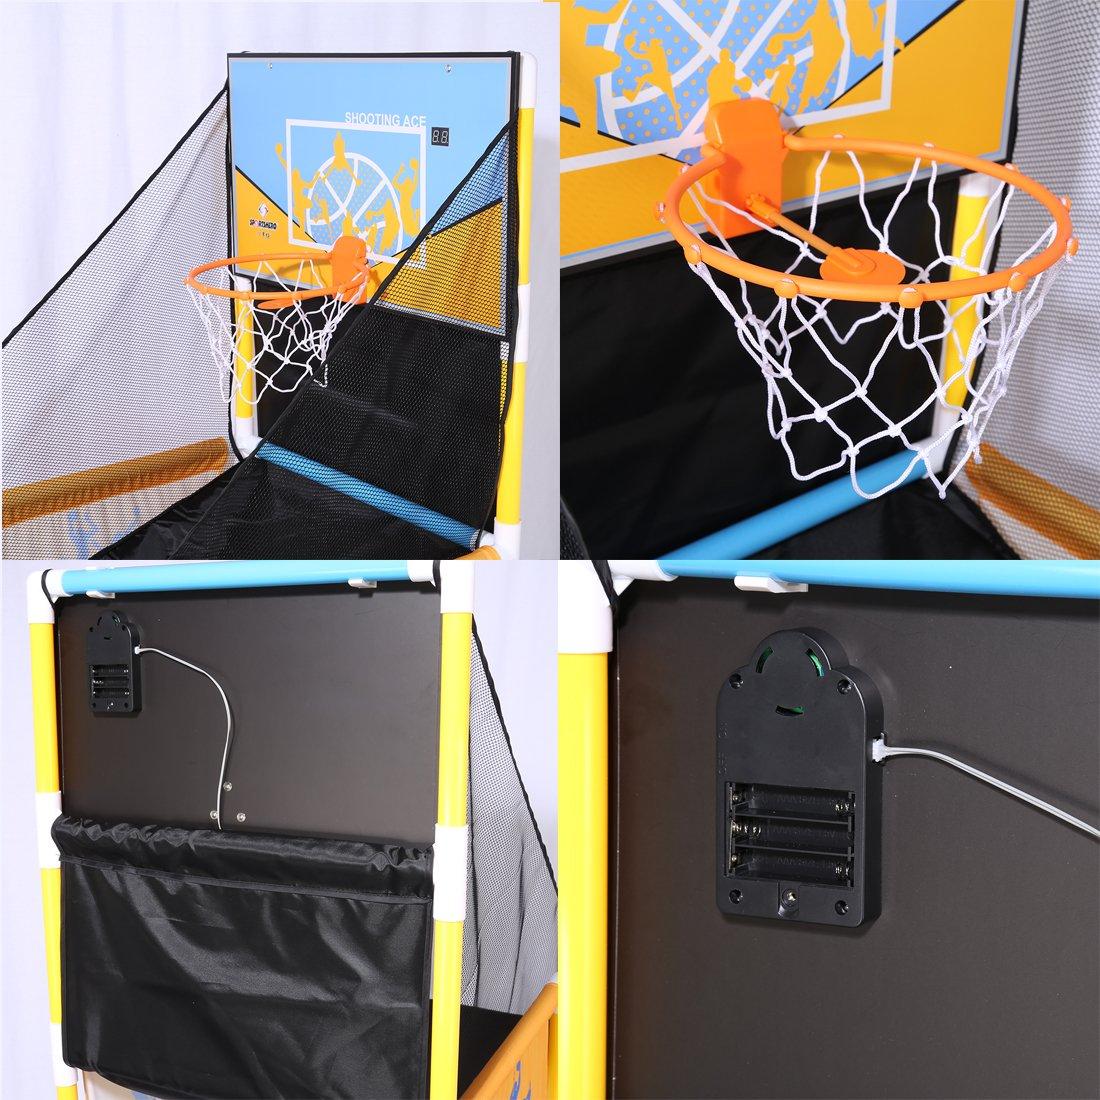 PINCHUANGHUI Automatic Scoring Basketball Shooting Machine Kids Teenagers Shooting Hoop by PINCHUANGHUI (Image #5)